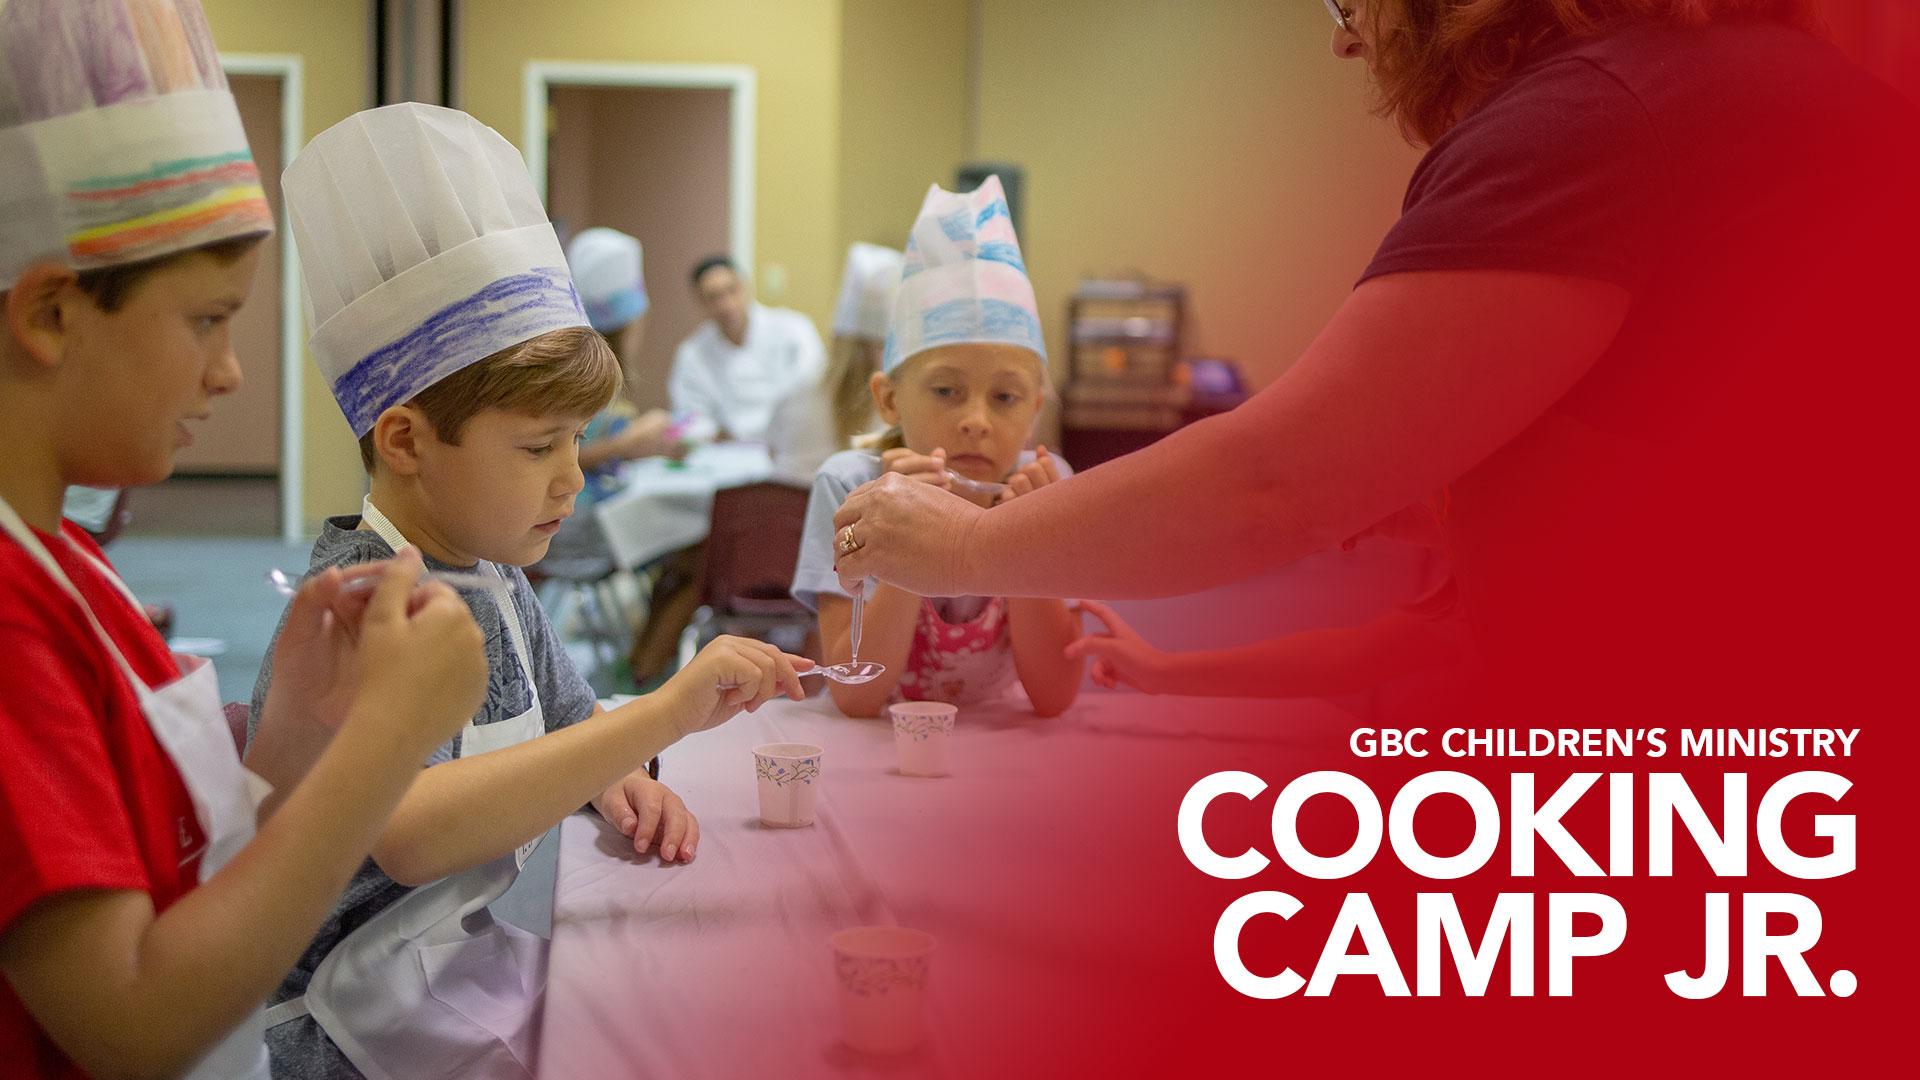 071819_Cooking-Camp_WEB.jpg